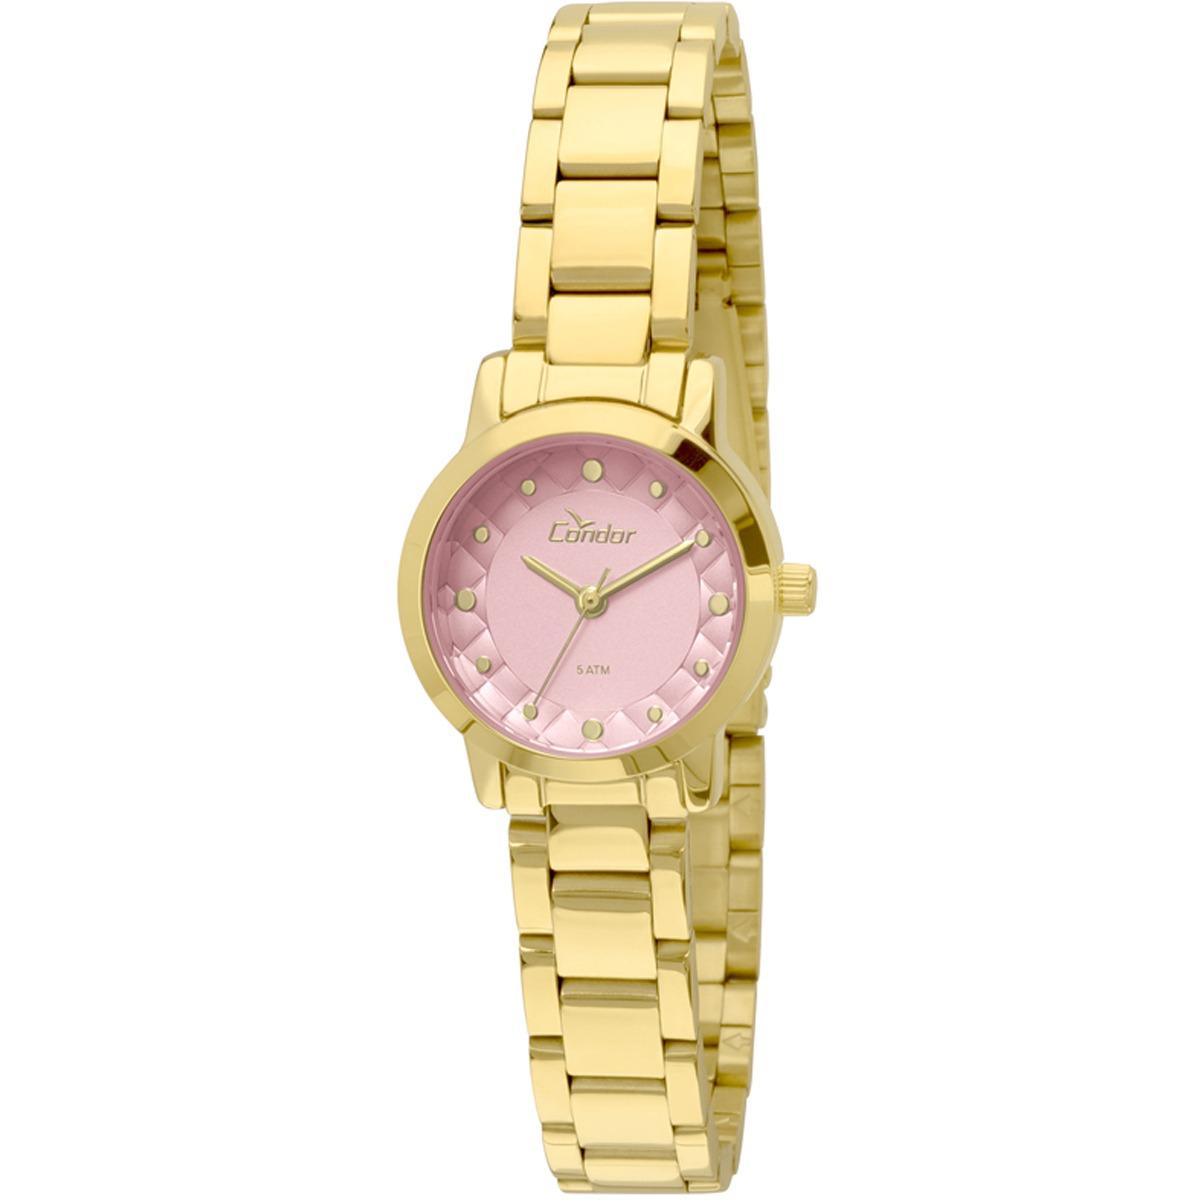 f2bb62475f4 Relógio Condor Mini Feminino Co2036knw 4t - R  149